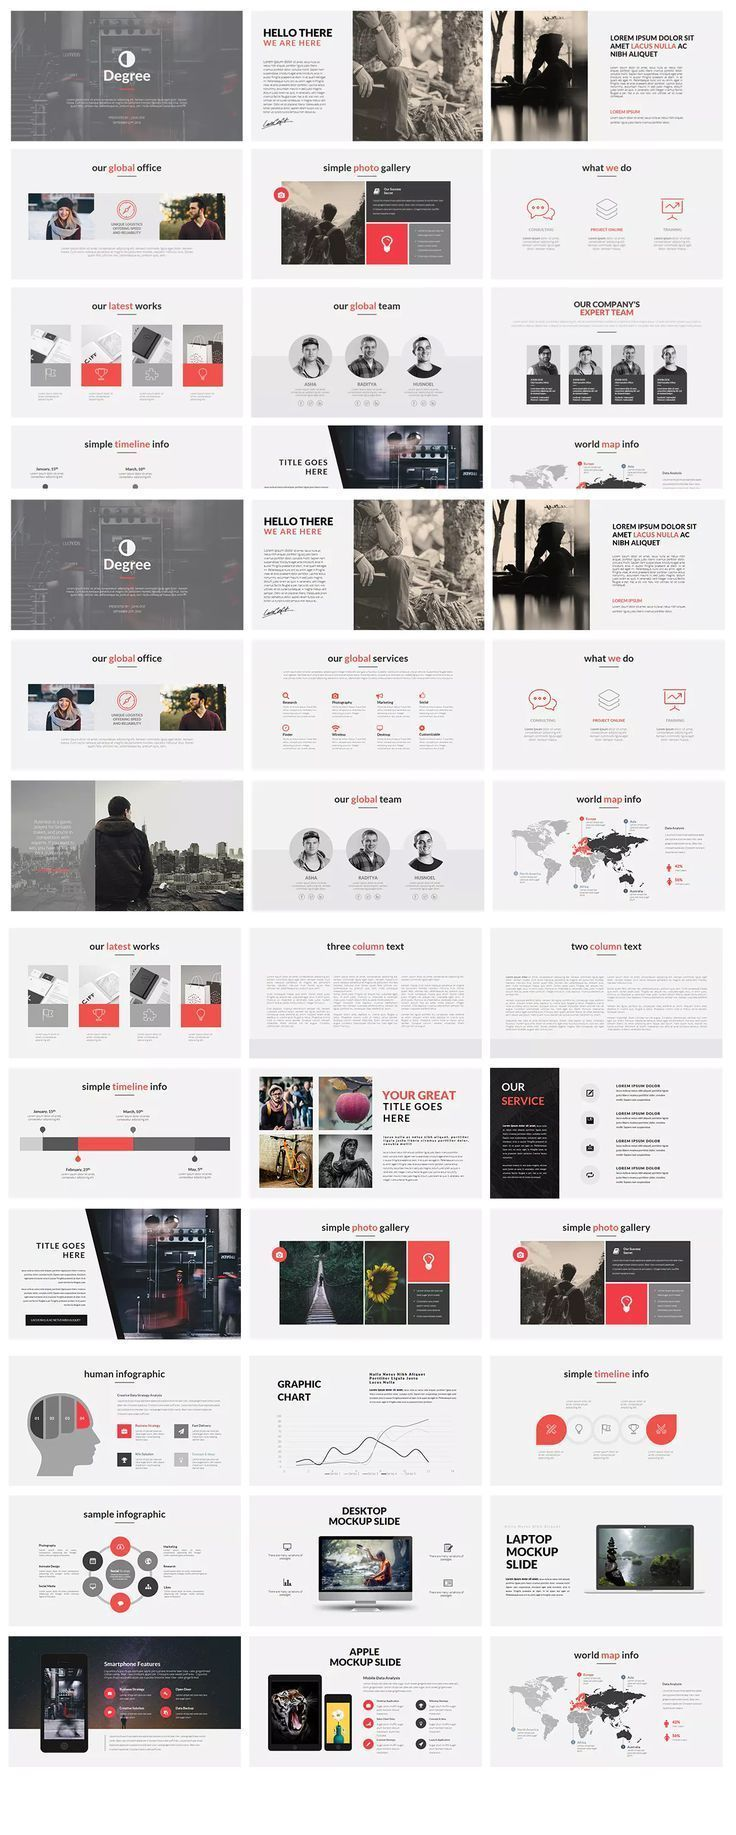 degree powerpoint presentation template design inspiration